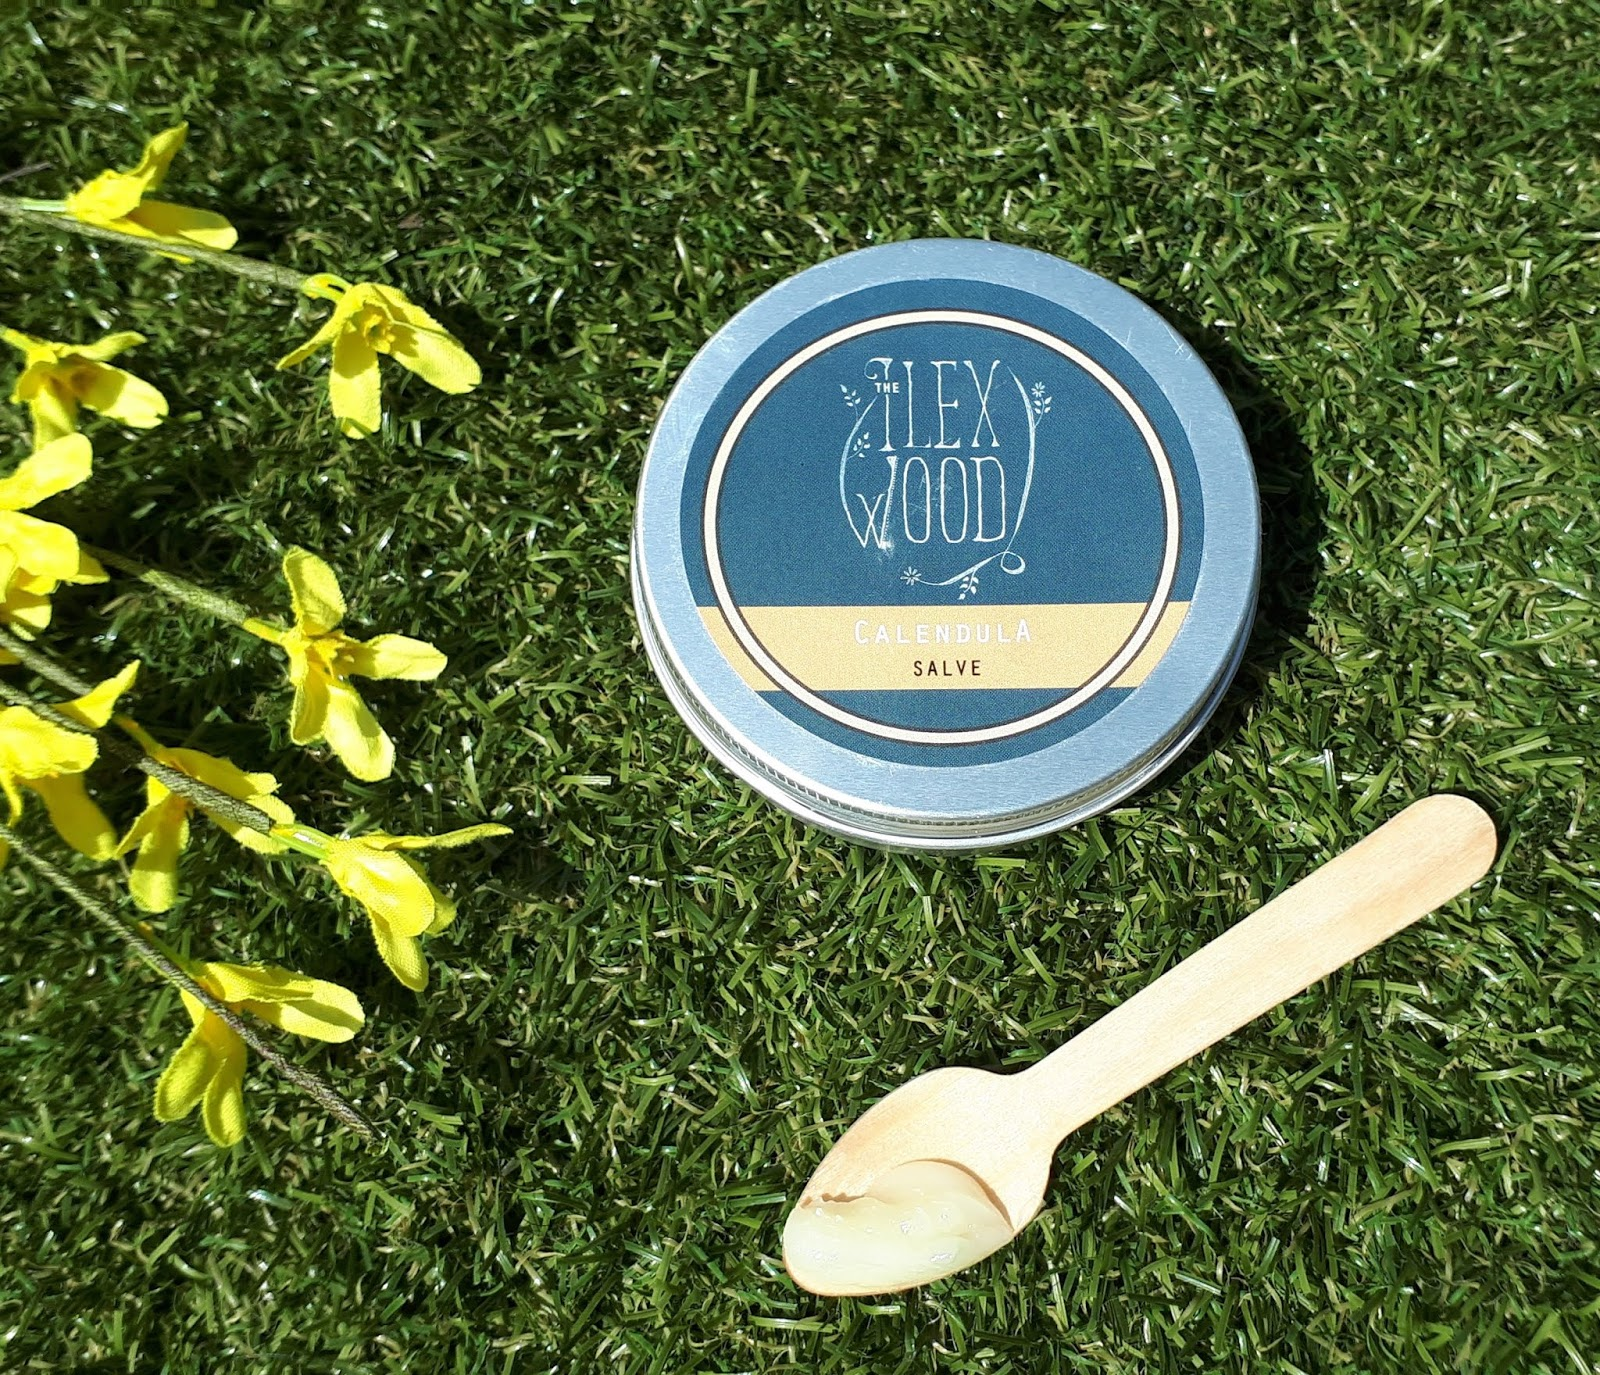 Plastic Free summer essentials - The Ilex Wood calendula salve review